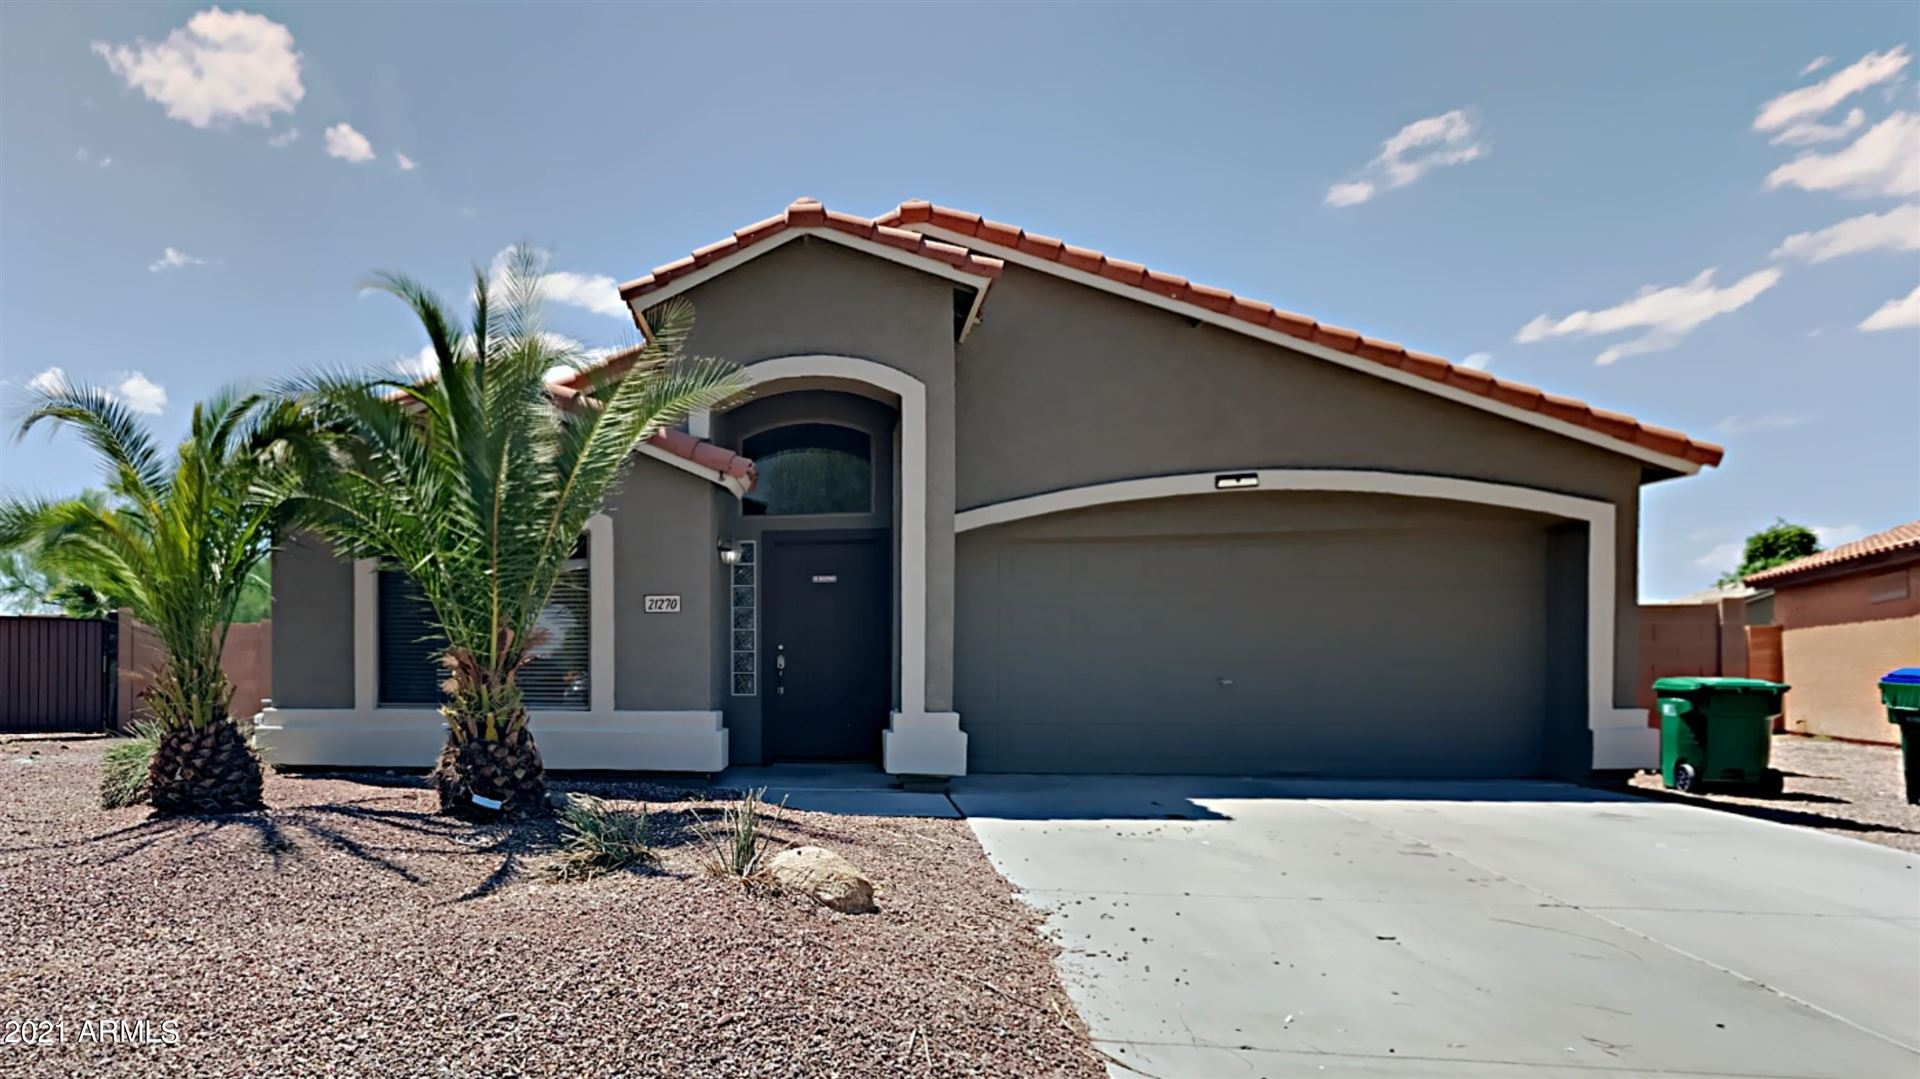 Photo for 21270 N HOWELL Drive, Maricopa, AZ 85138 (MLS # 6283640)